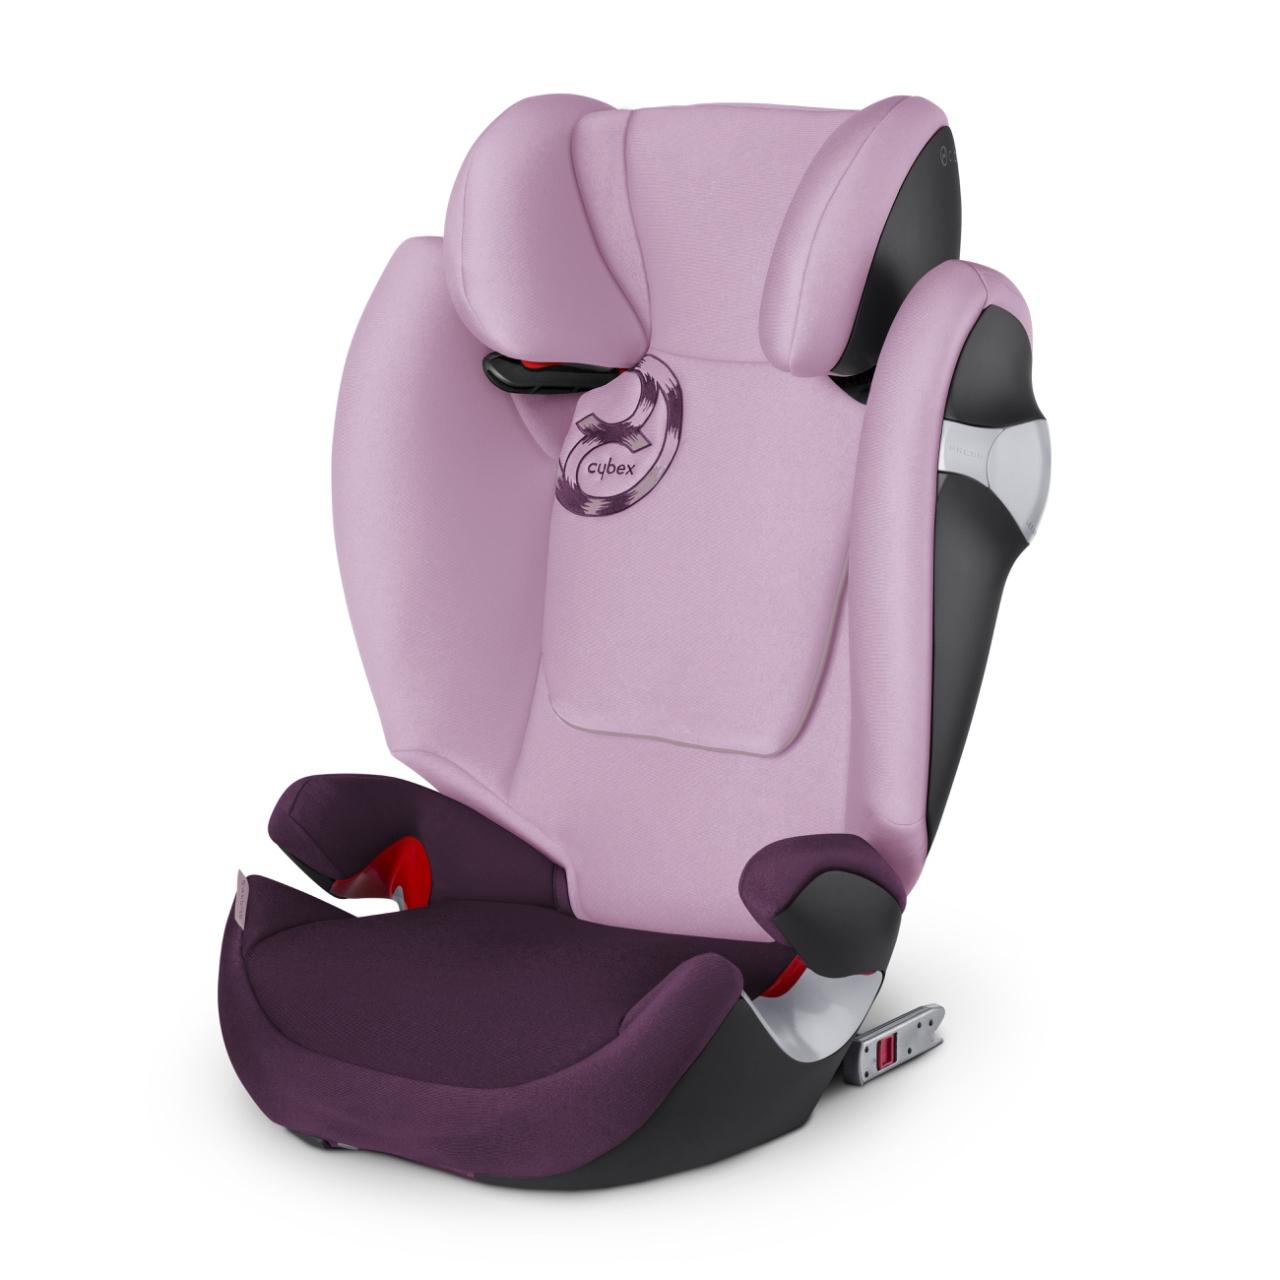 *babygo*德國Cybex--SOLUTION M-FIX 2016汽車安全座椅(3~12歲)/紫色 {限量!加贈企鵝水杯240ml}